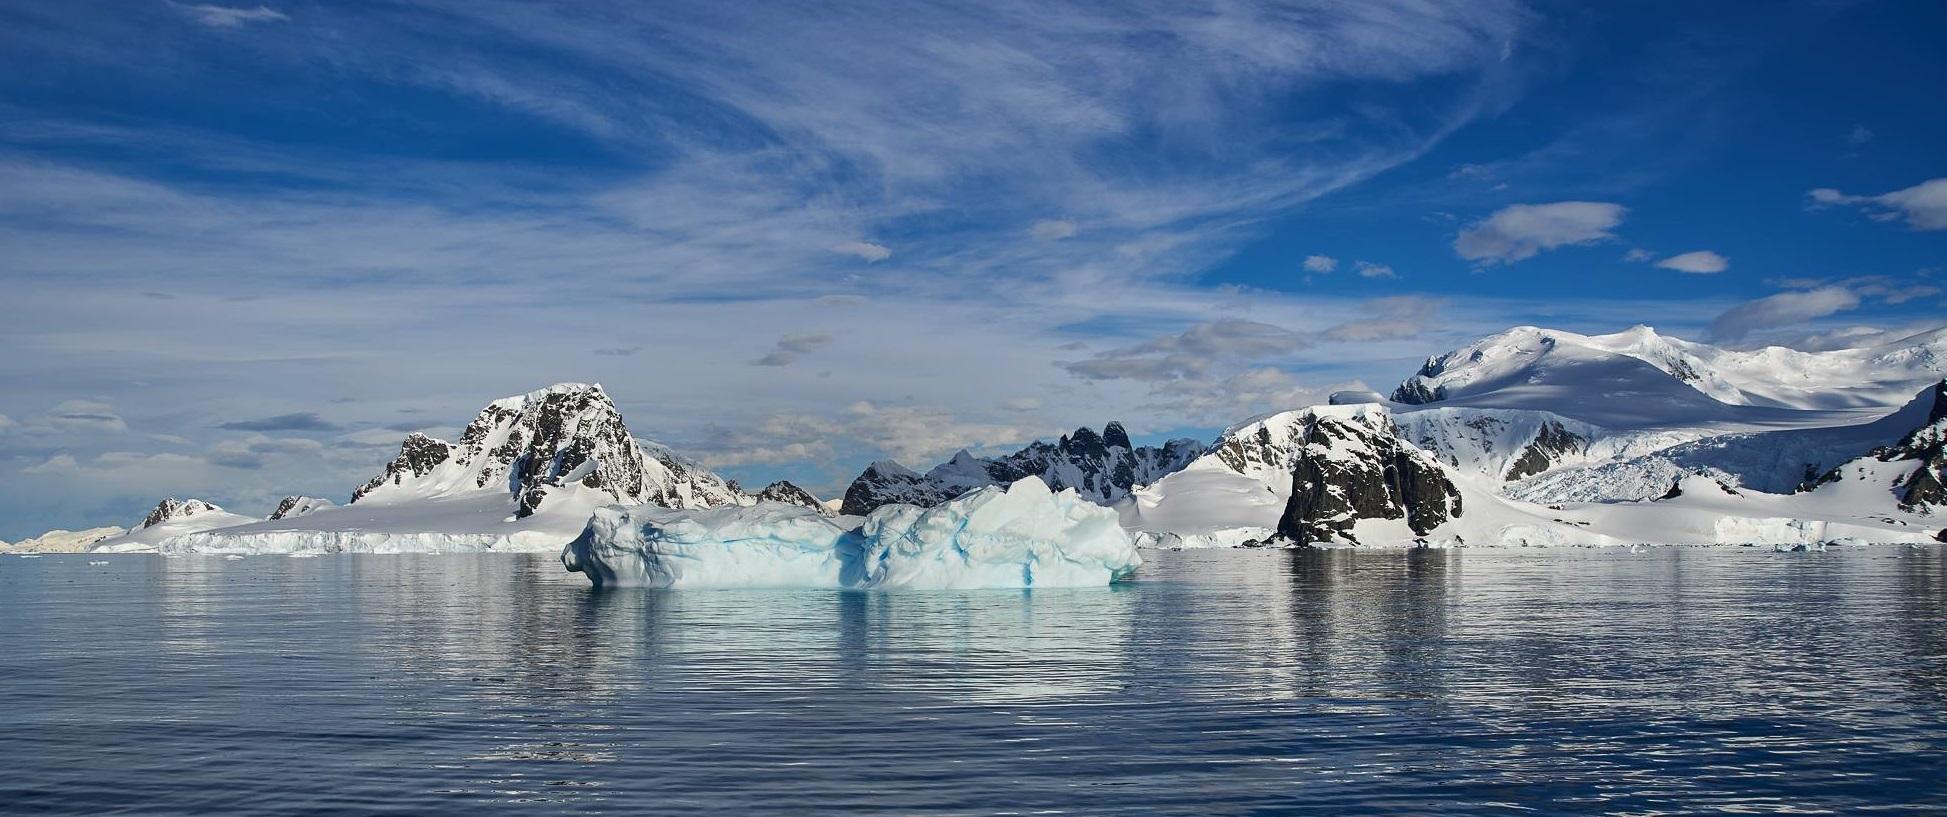 Antartcic-image-of-icebergs2.jpg